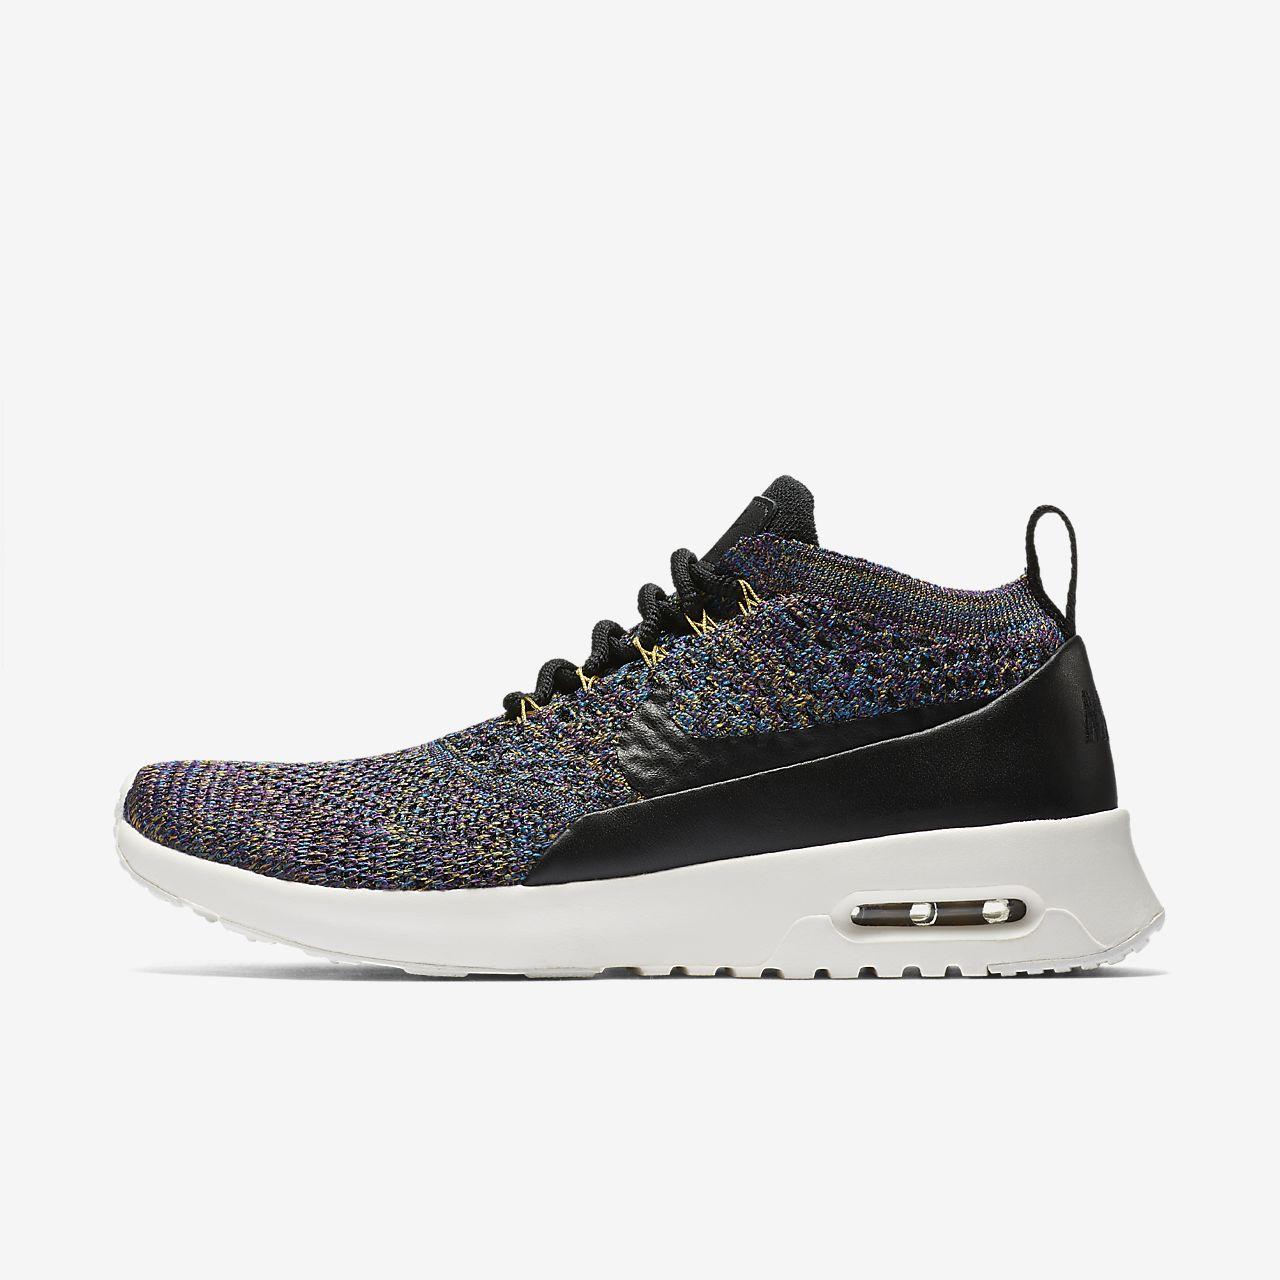 84828241d8b Τα 18 καλύτερα γυναικεία αθλητικά παπούτσια - Runster